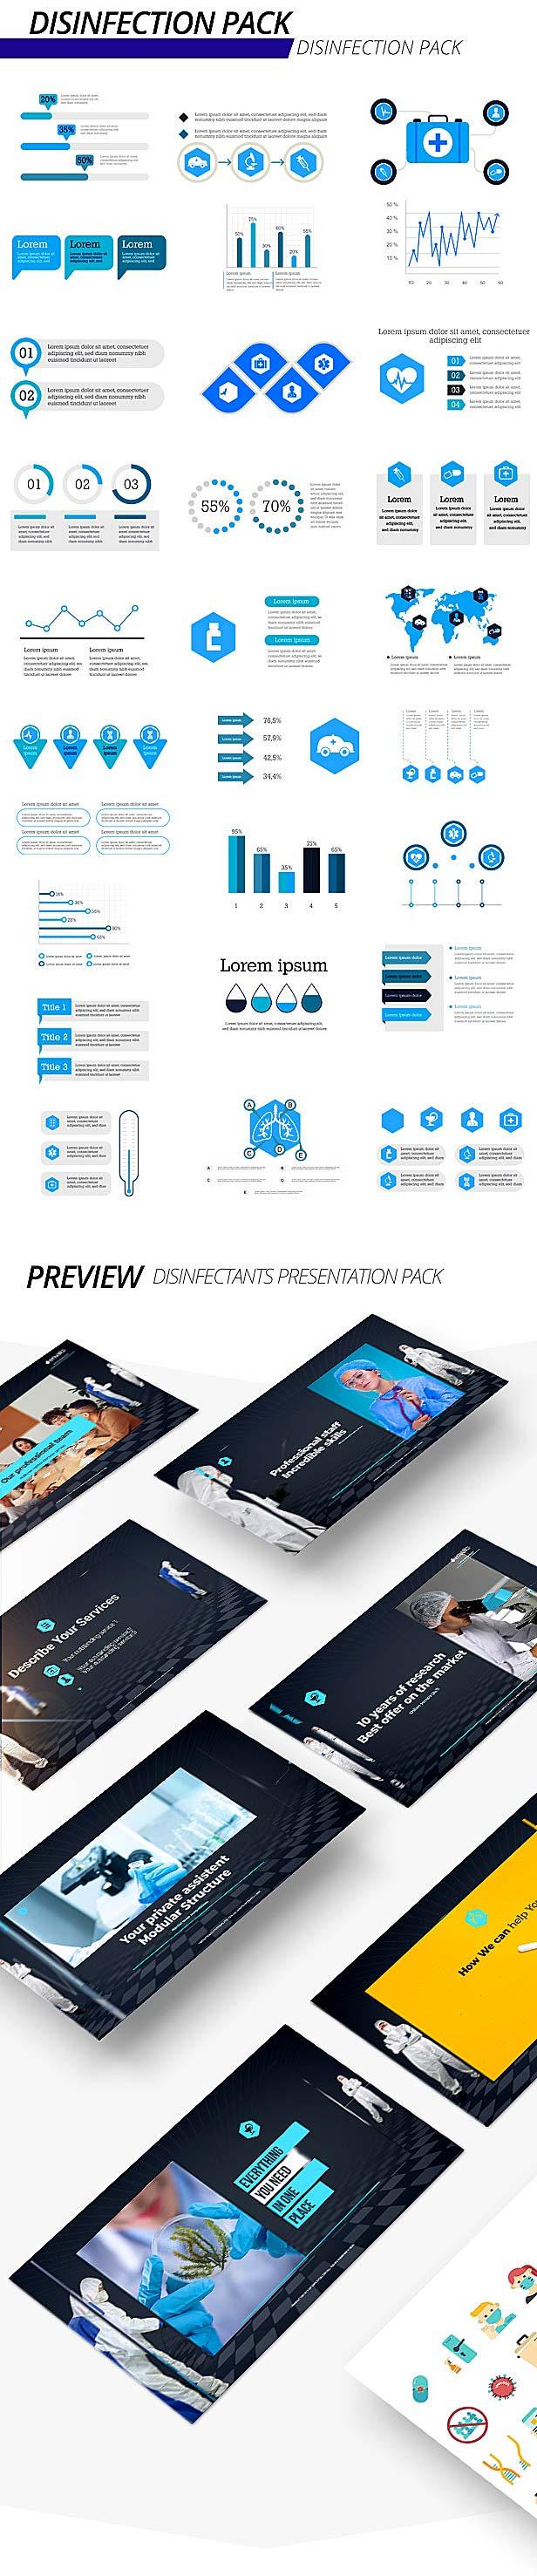 Desinfection Presentation Pack - 2